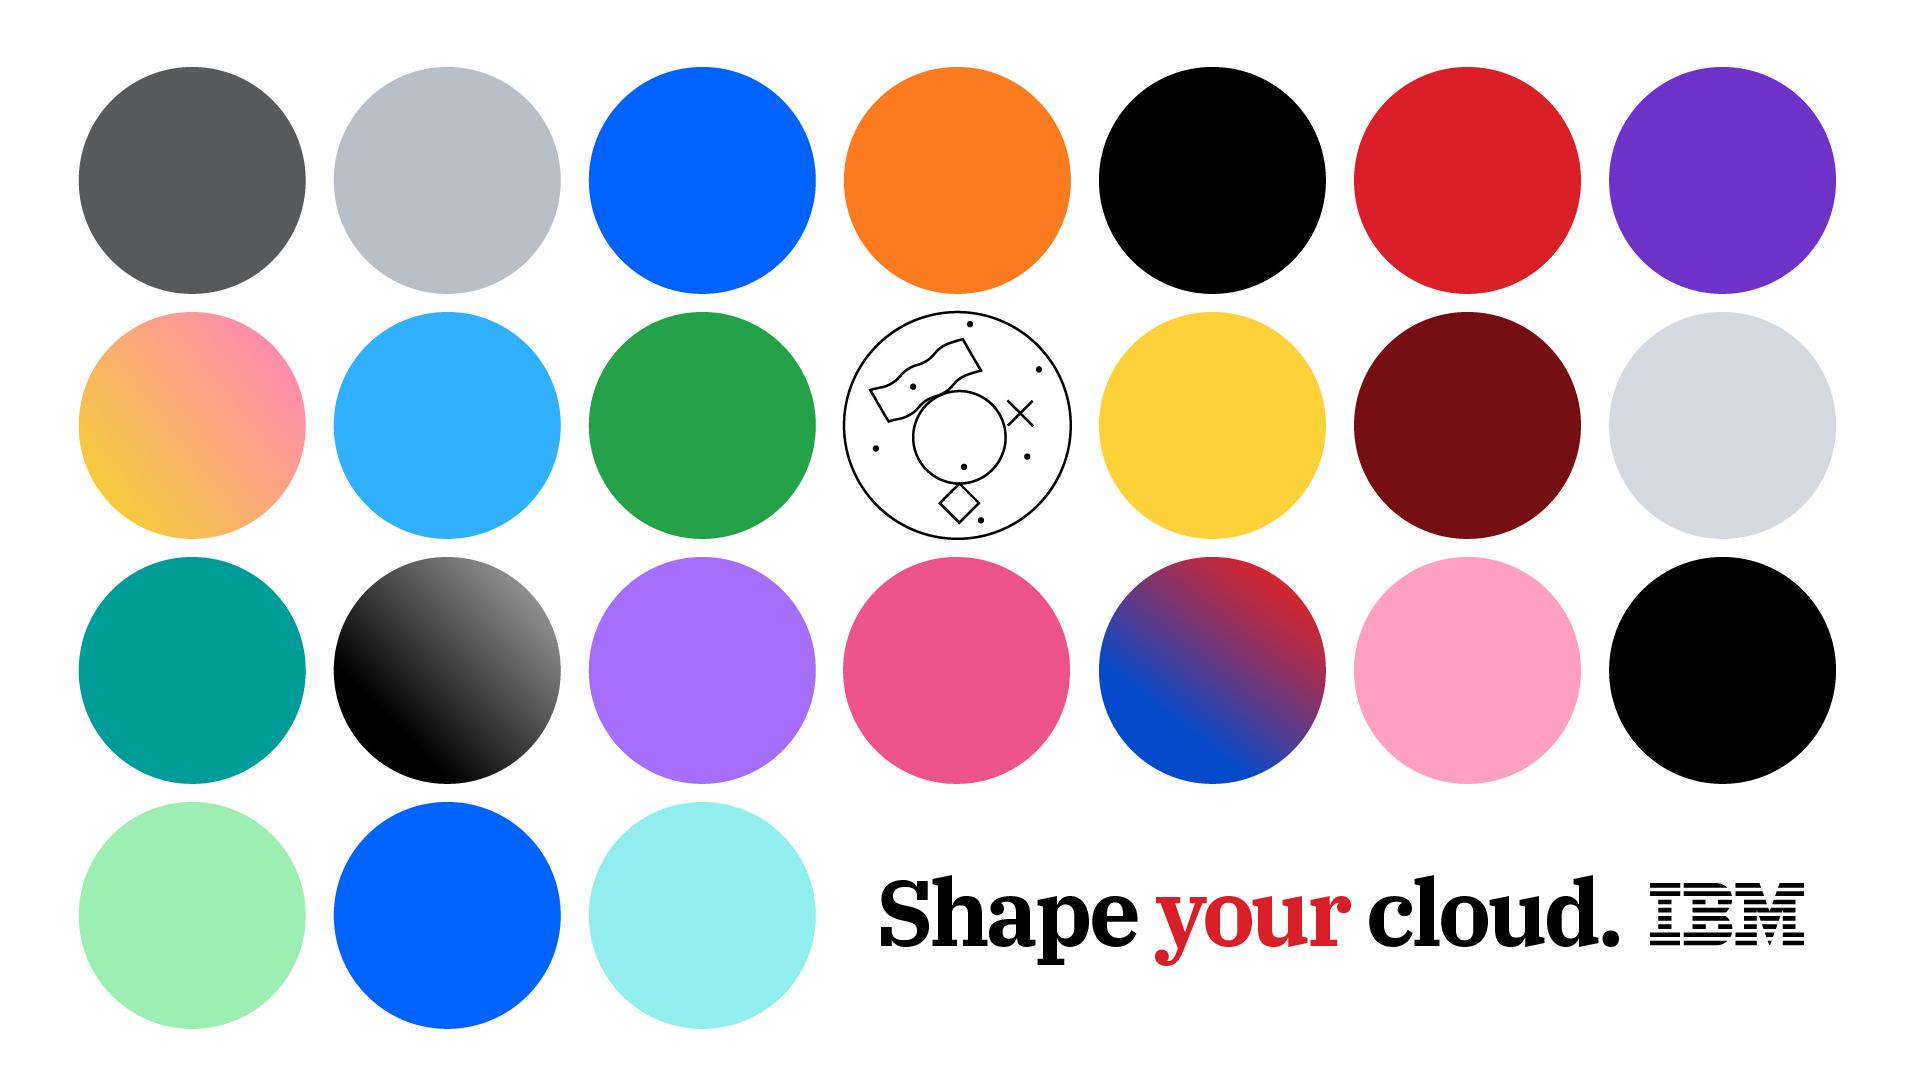 IBM_SHAPE-YOUR-CLOUD_DC_EDITS_BH_proceso_IBM-process-25.jpg